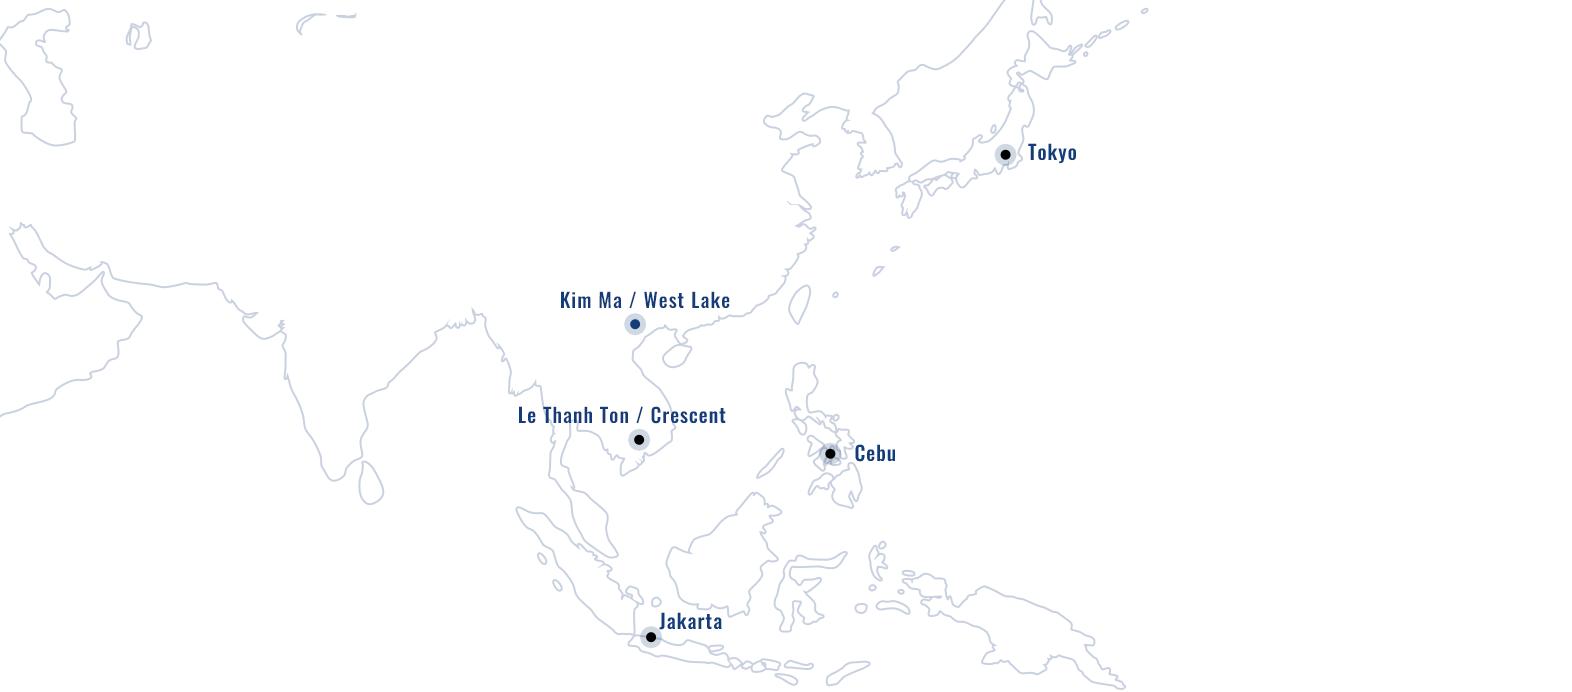 Brilliant Groupの拠点一覧の世界地図